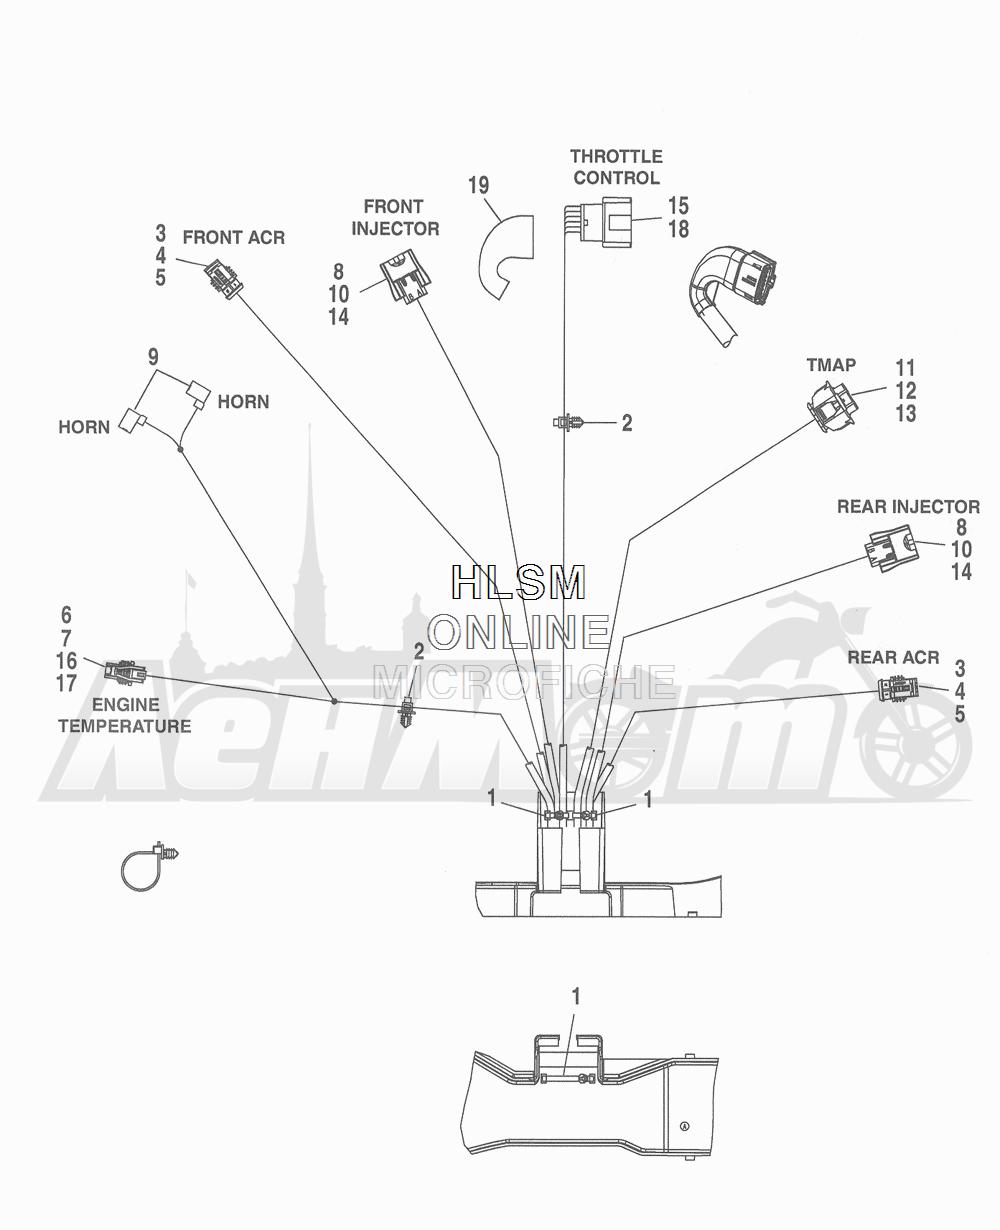 Запчасти для Мотоцикла Harley-Davidson 2016 FLHTCU 103 ULTRA CLASSIC ELECTRAGLIDE (FCM) Раздел: WIRING HARNESS_ MAIN - ABS (FAIRING MODELS) - 3 | электропроводка главный жгут ABS (модели с обтекателем) 3